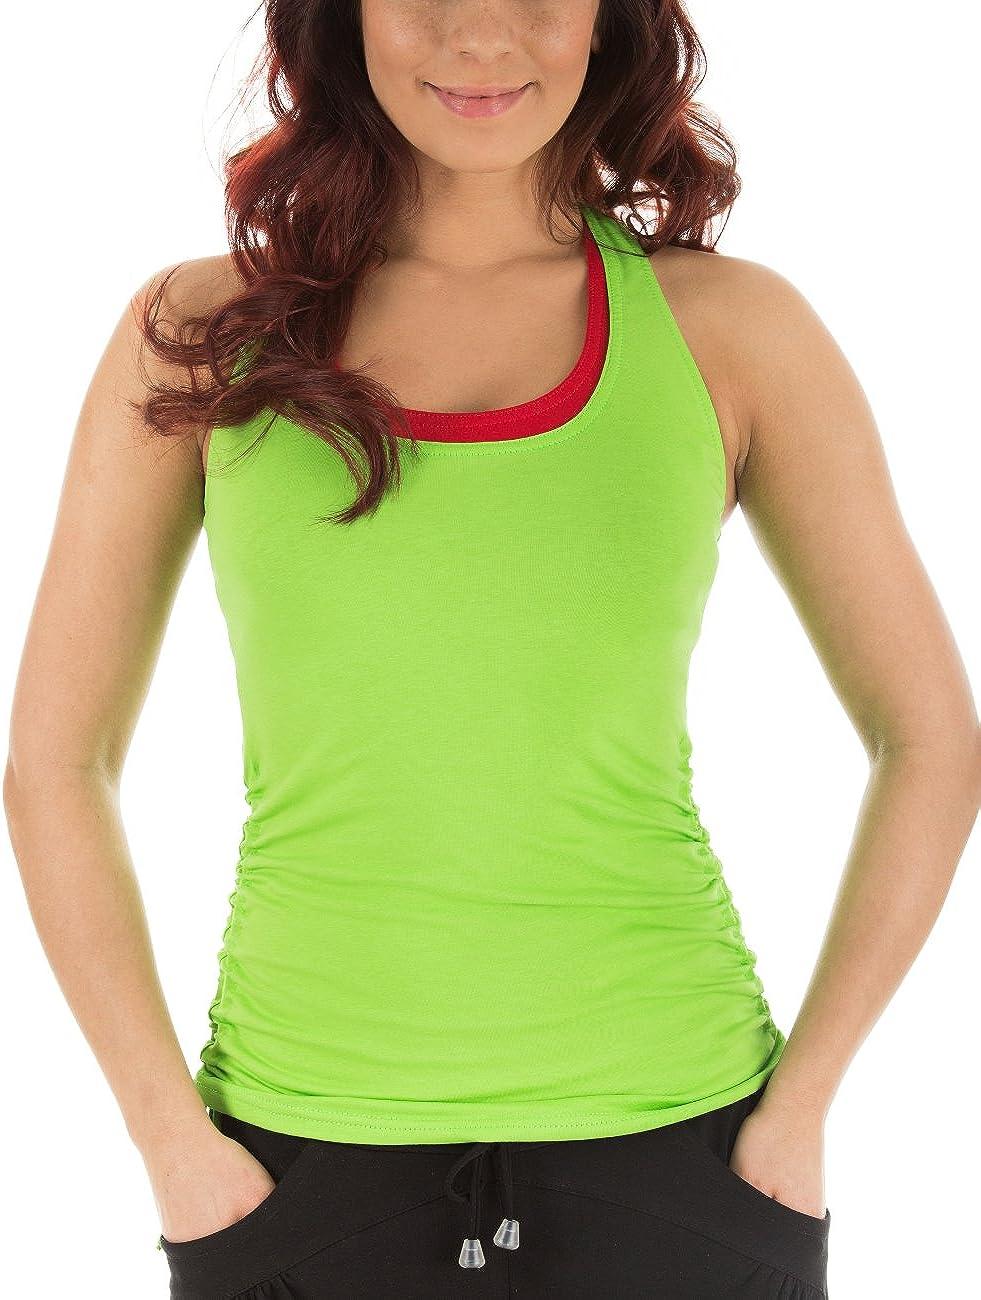 Winshape WVR20 Camiseta de Baile o Entrenamiento para Mujer